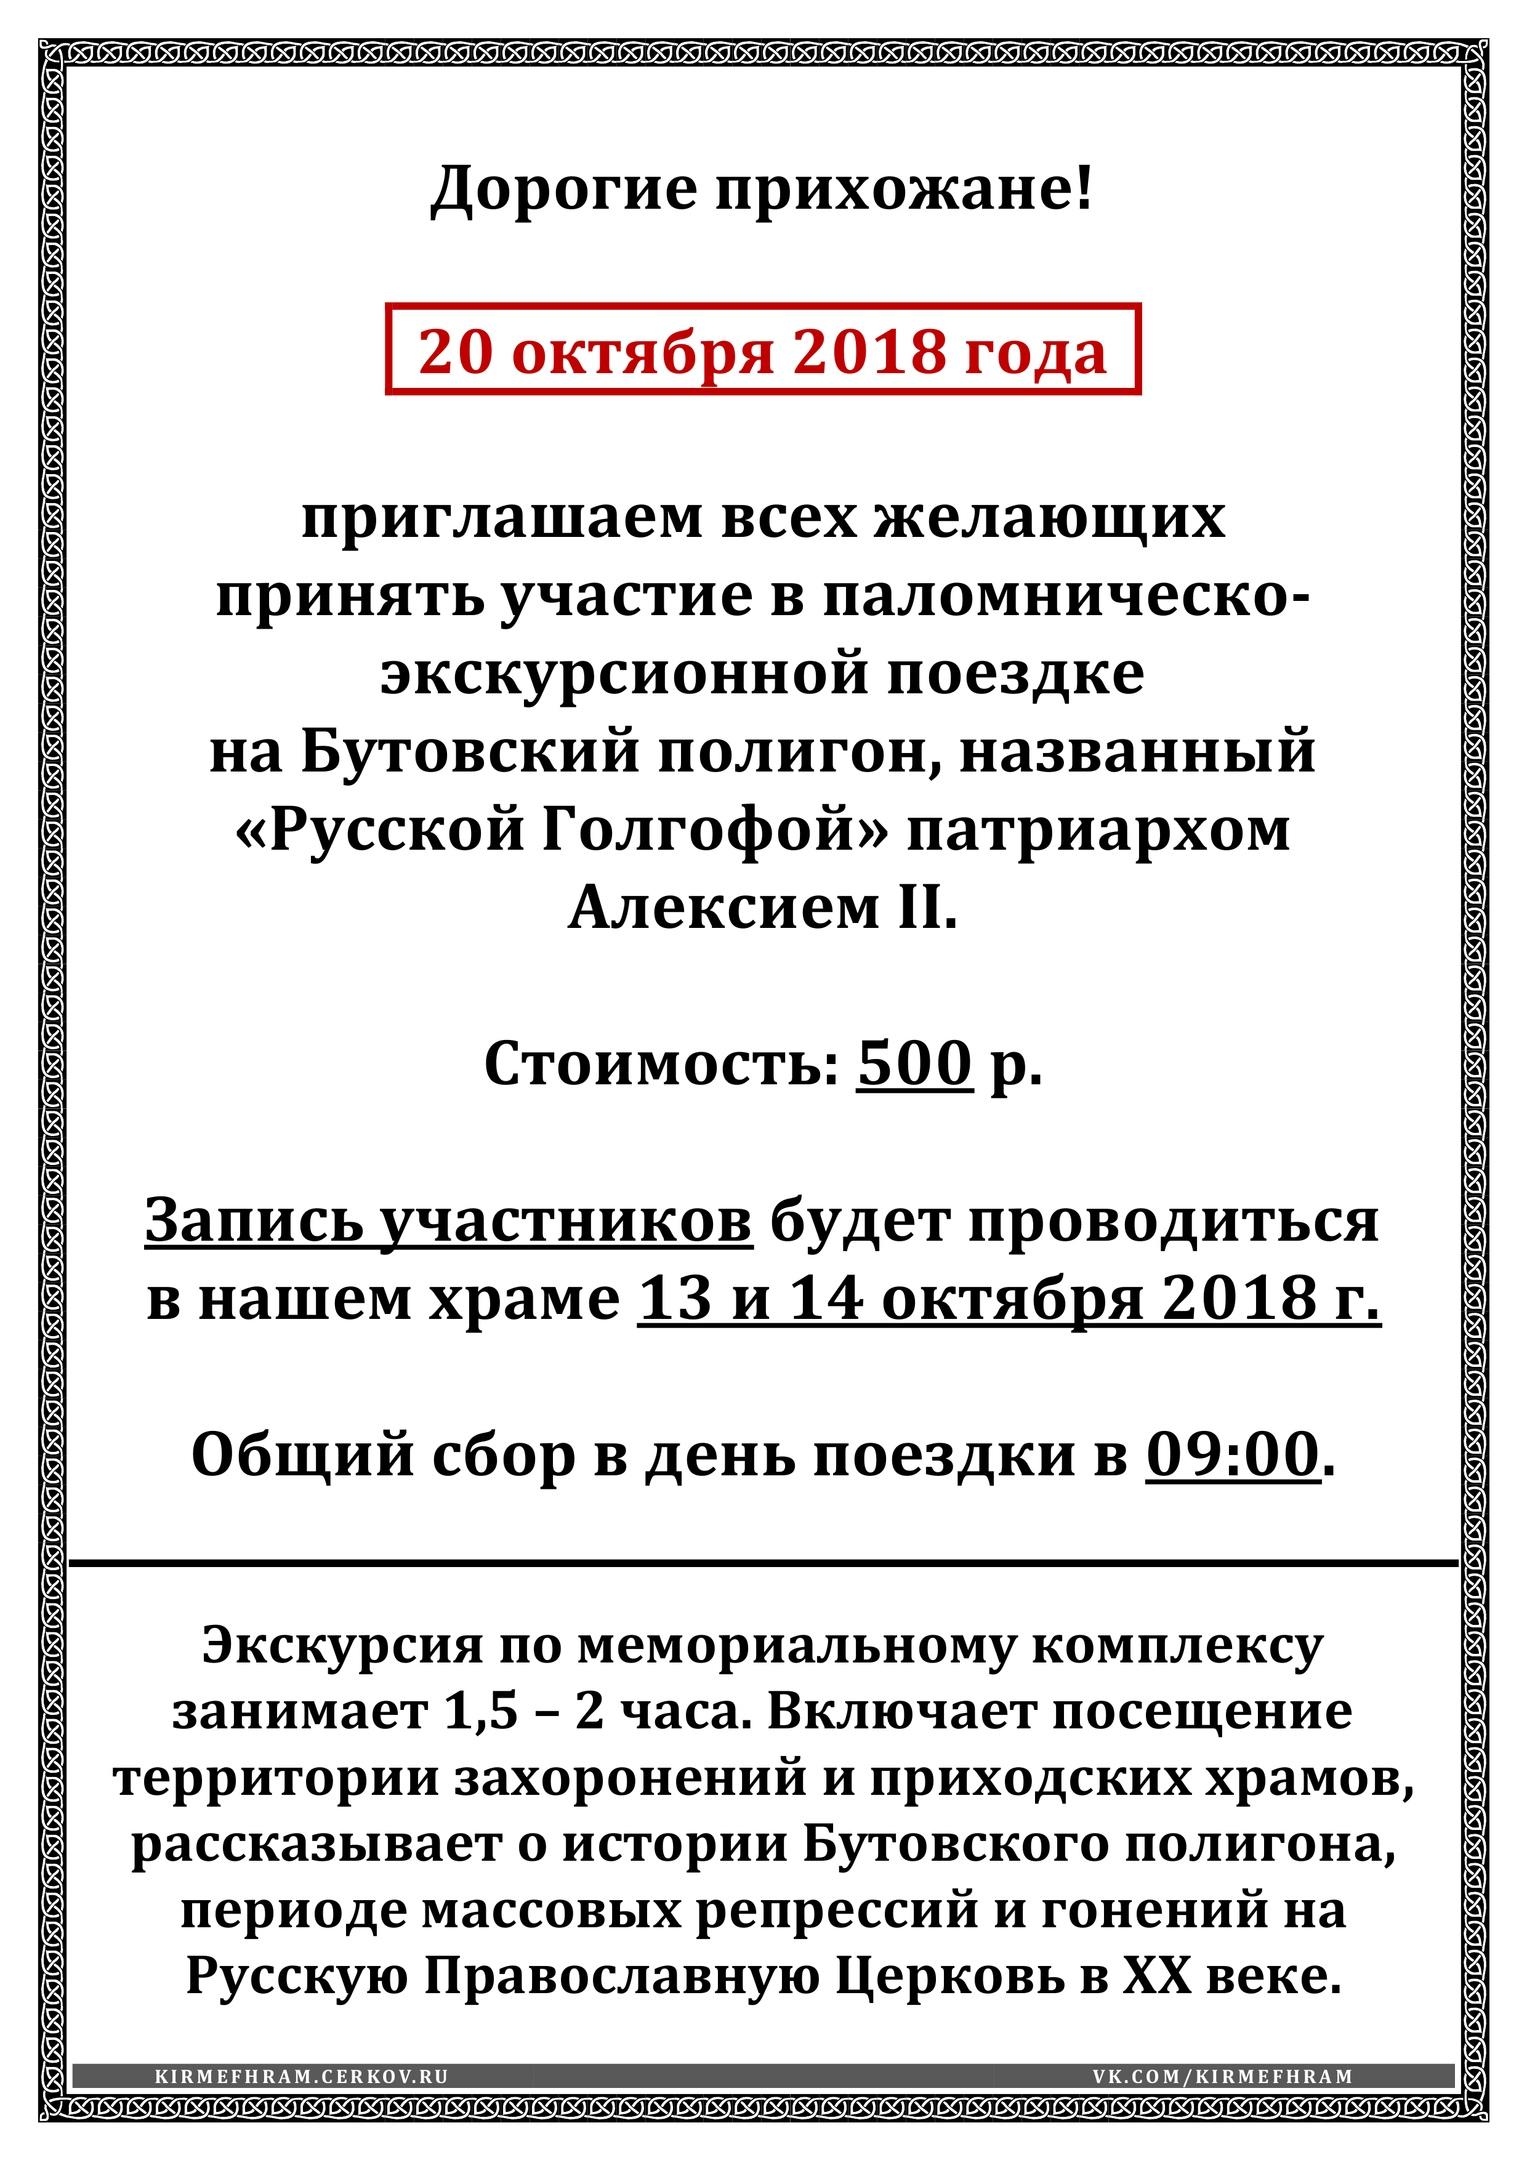 https://pp.userapi.com/c845020/v845020453/10b9e1/uY_v6xZrKZU.jpg